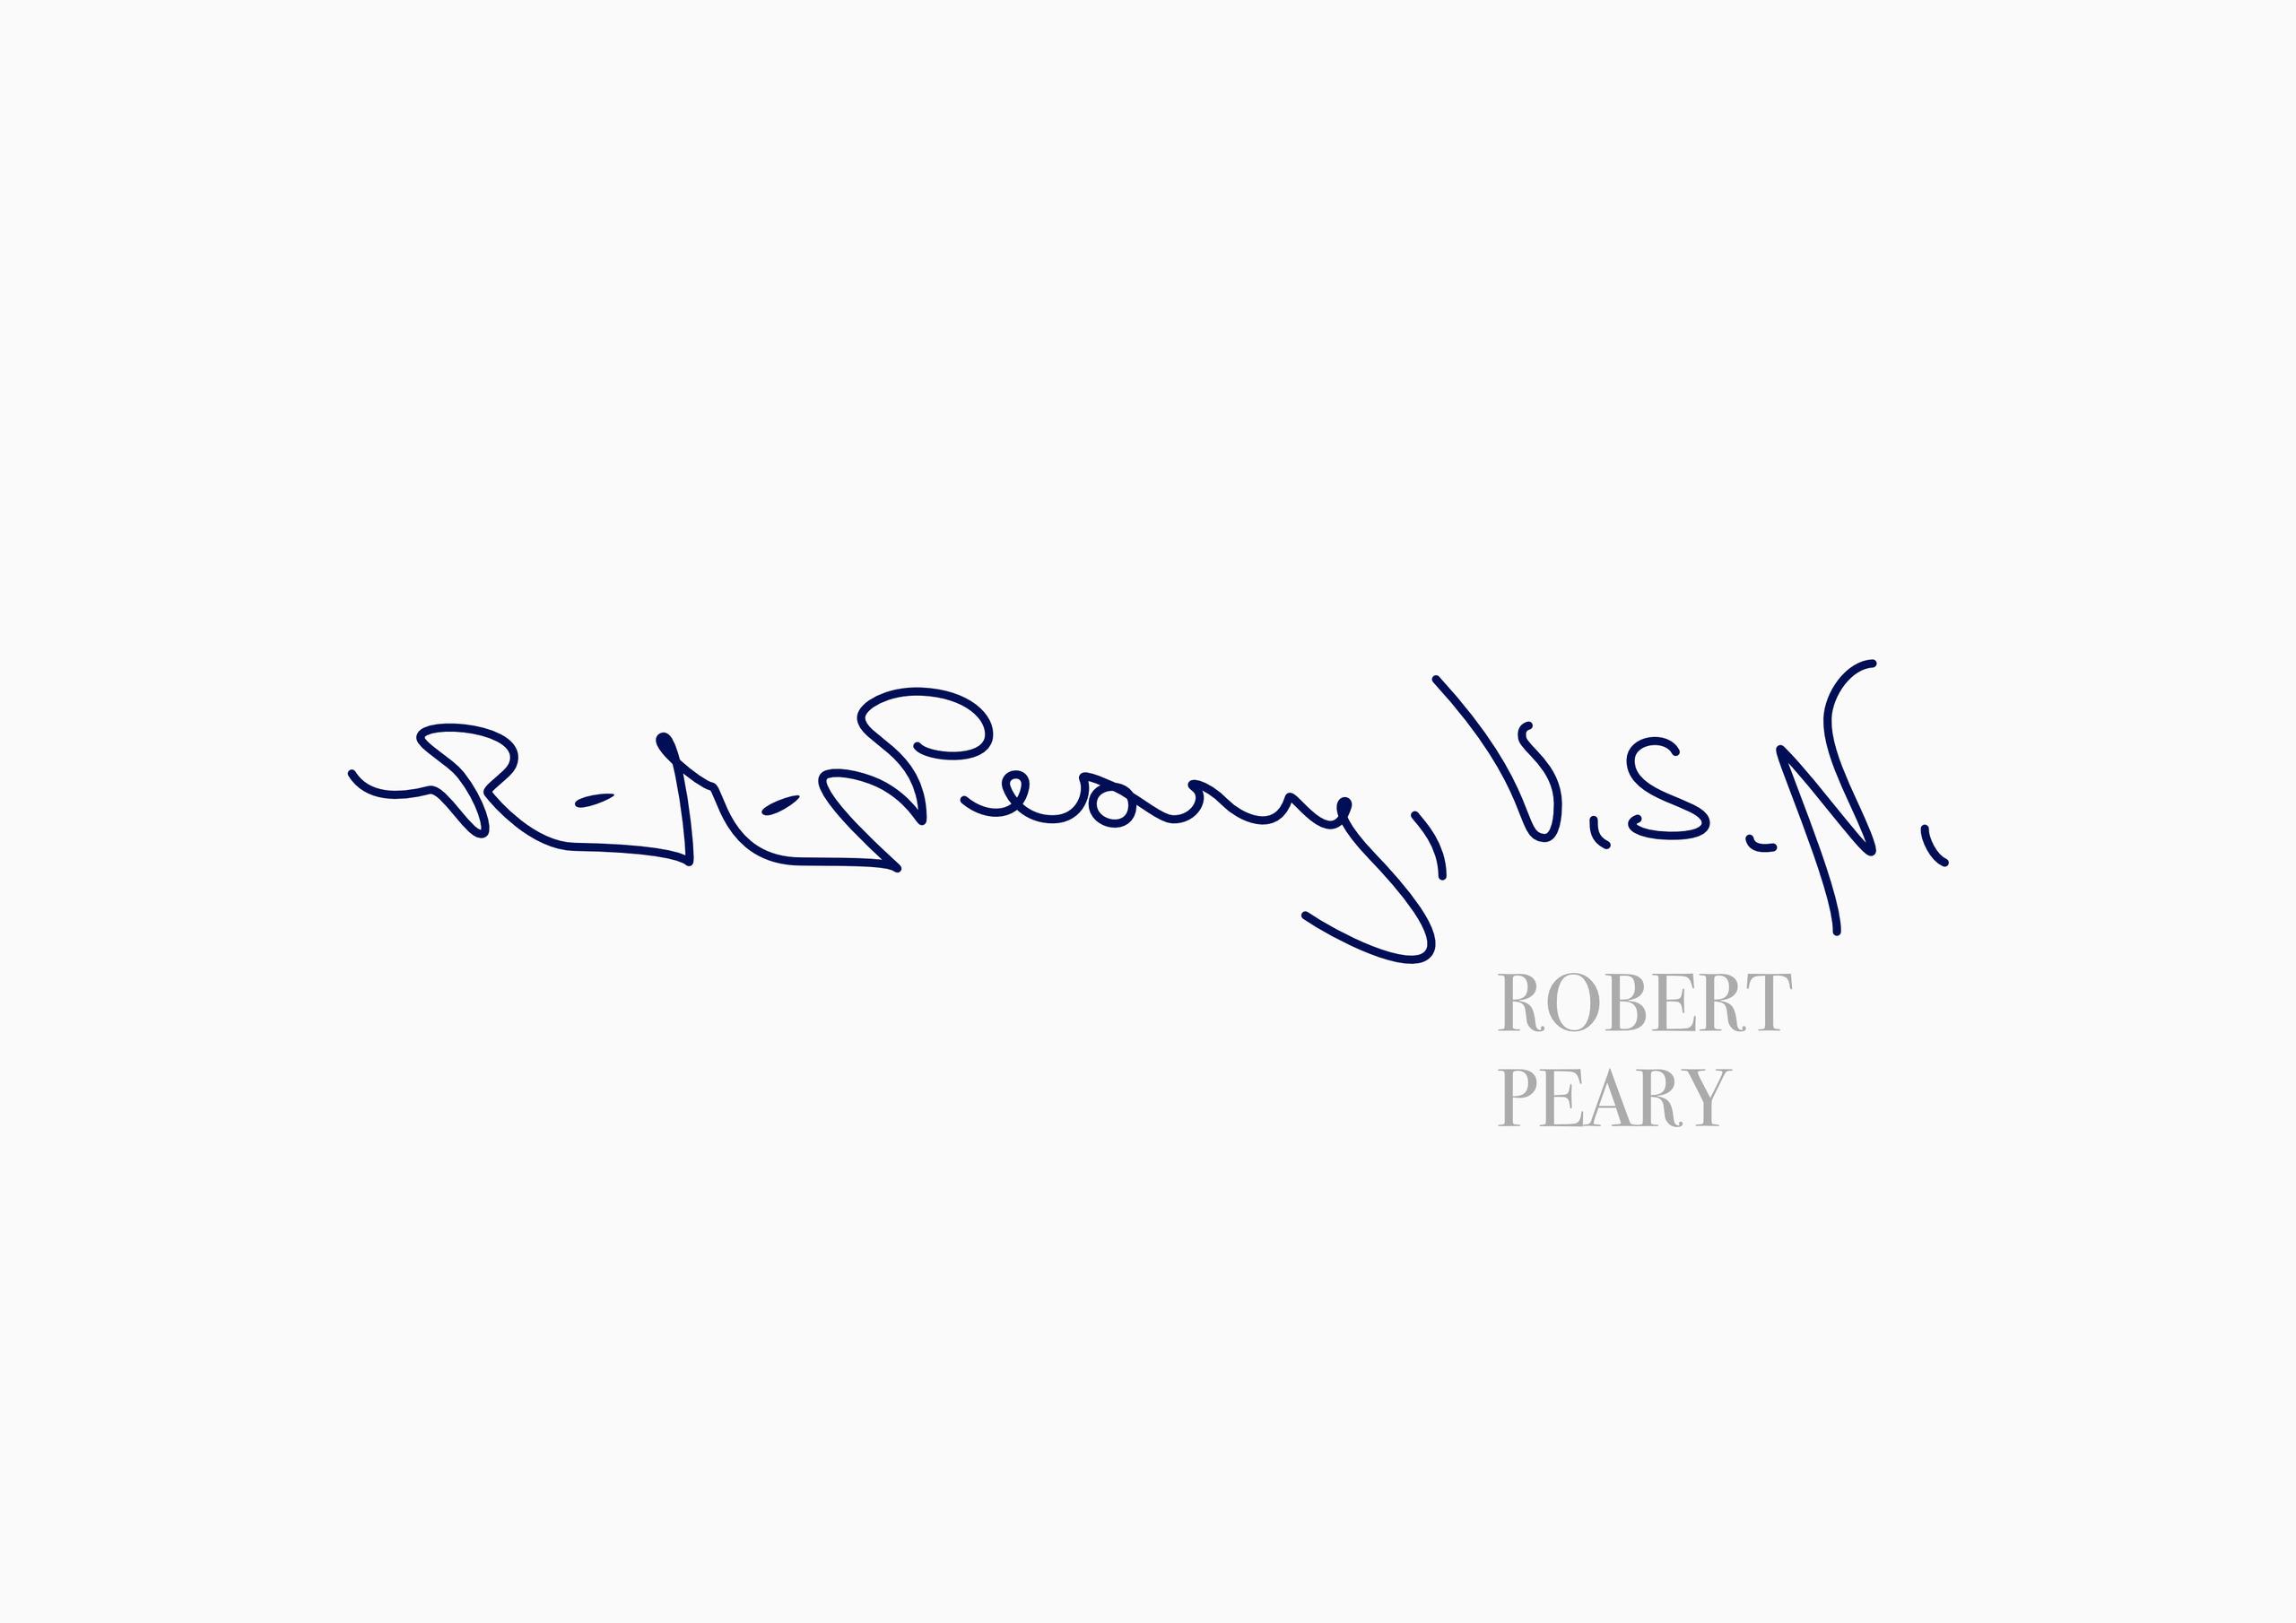 robert-peary.png